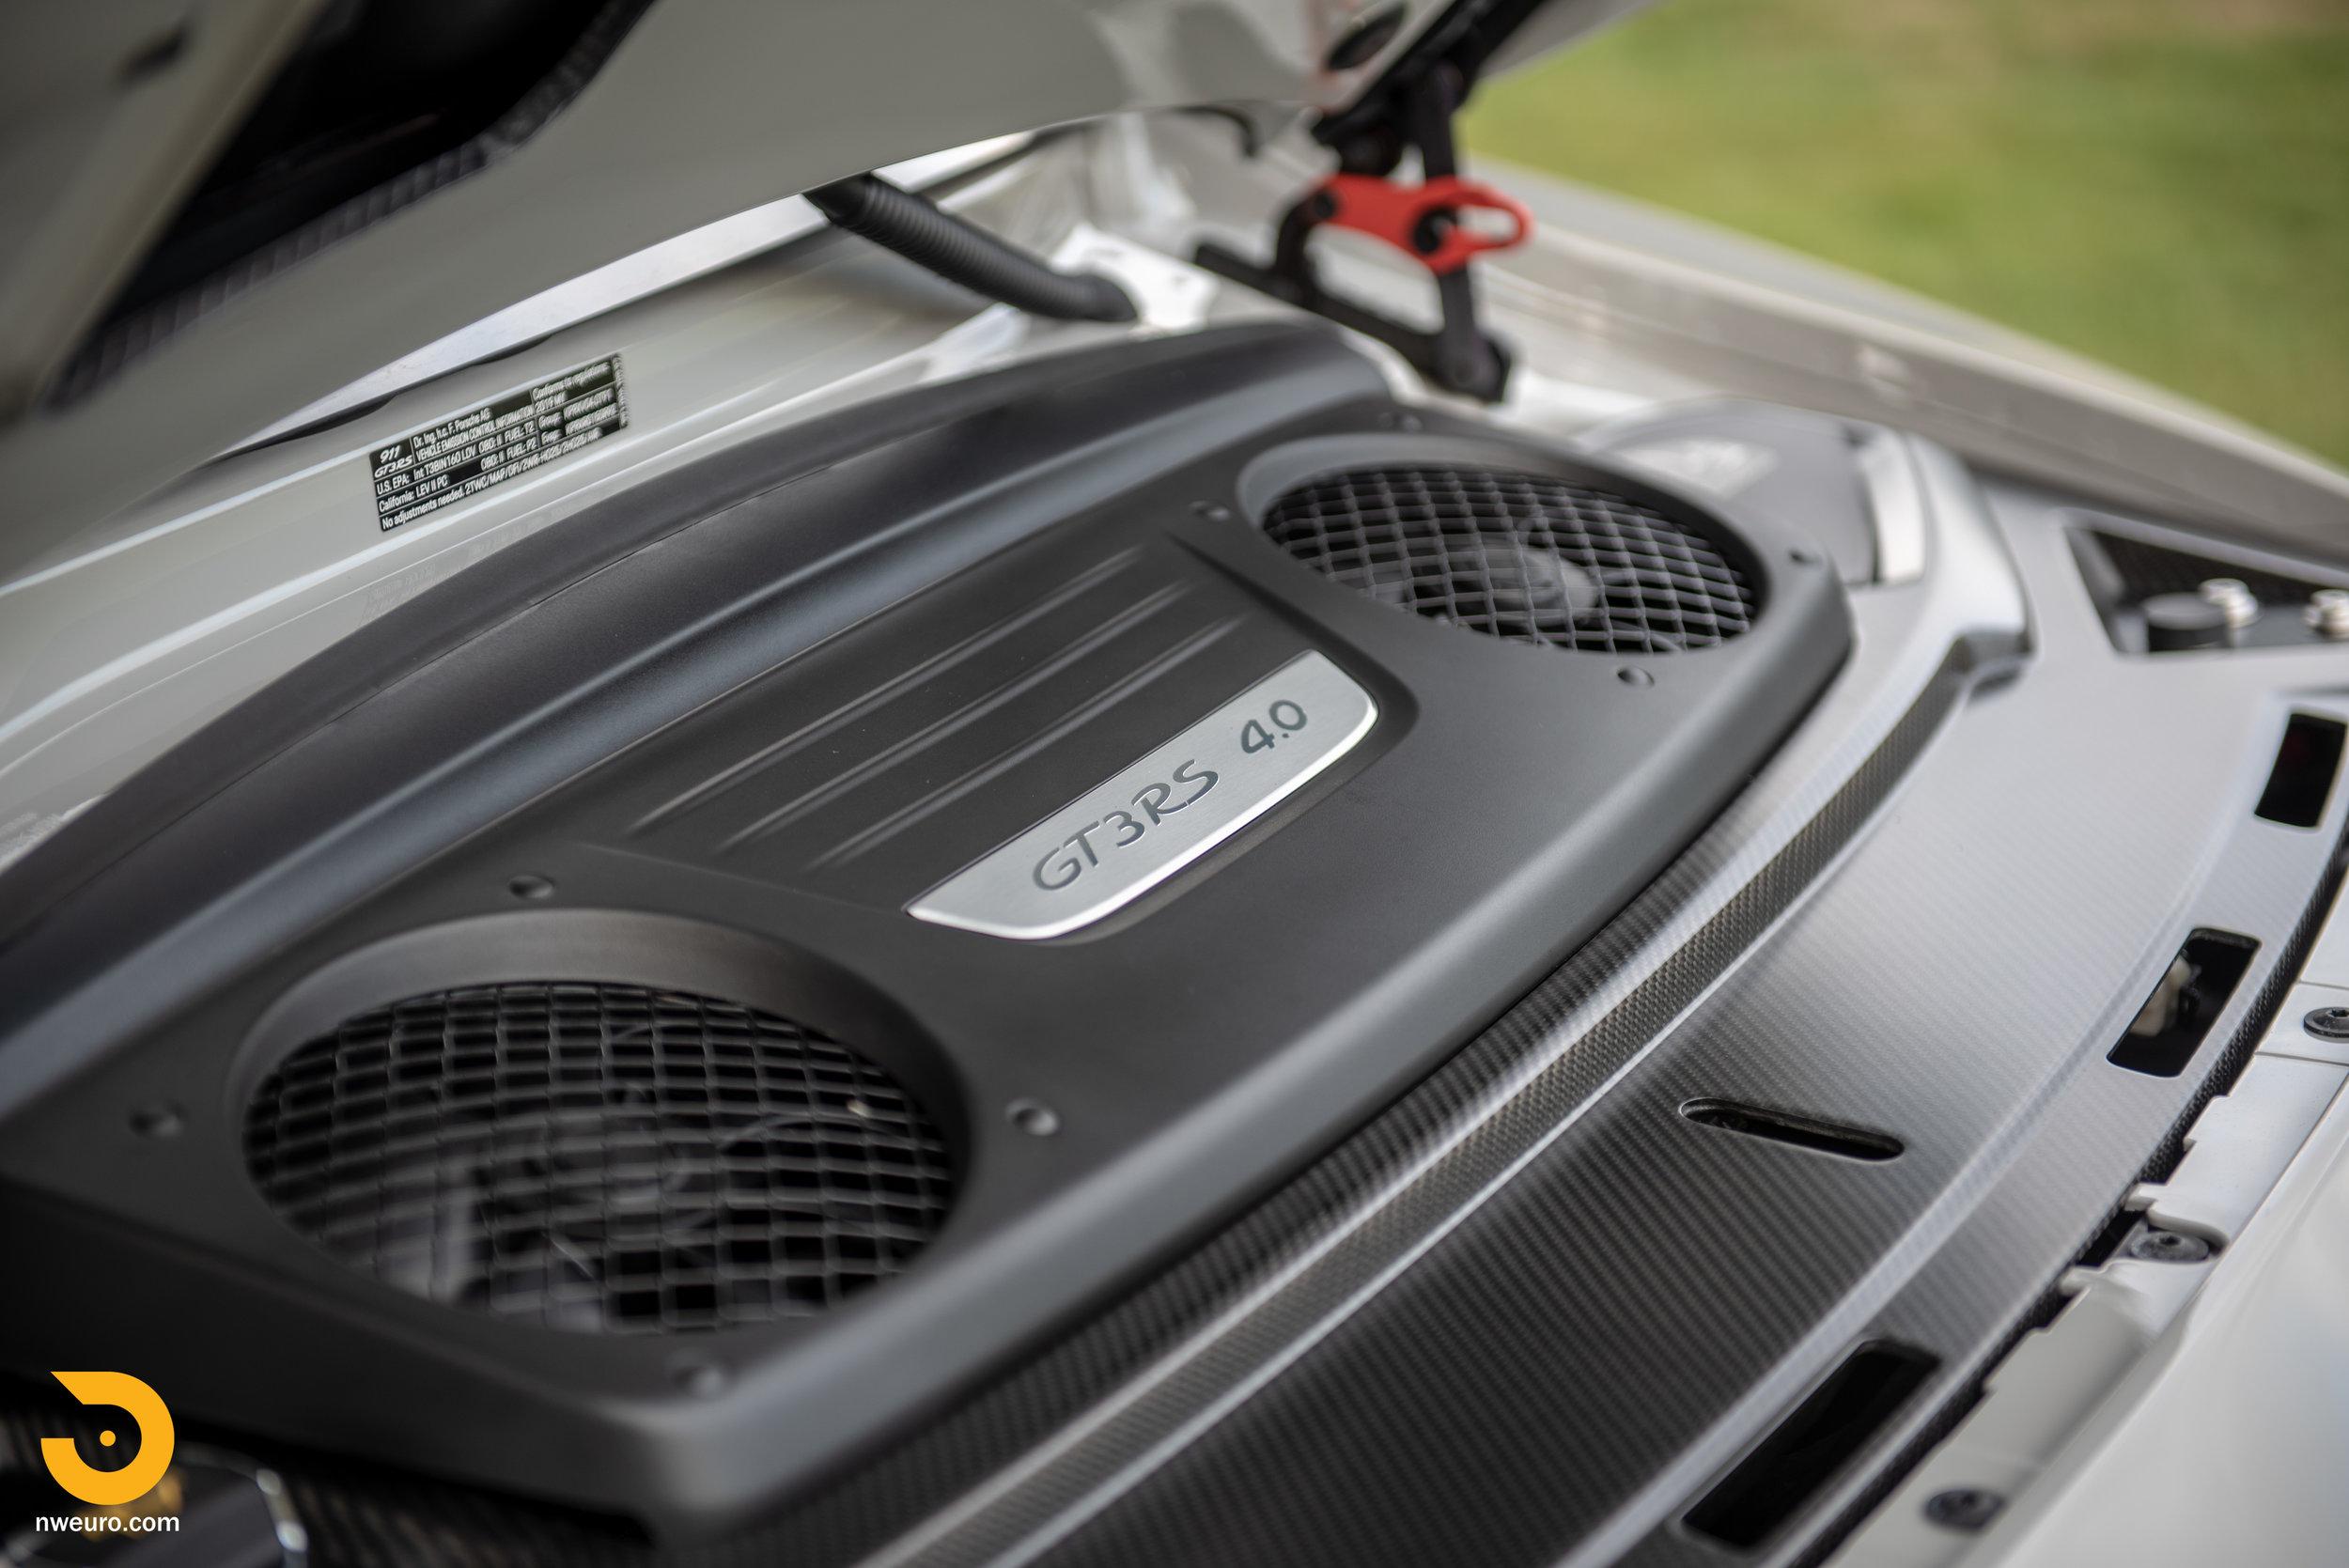 2019 Porsche GT3 RS - Chalk-38.jpg